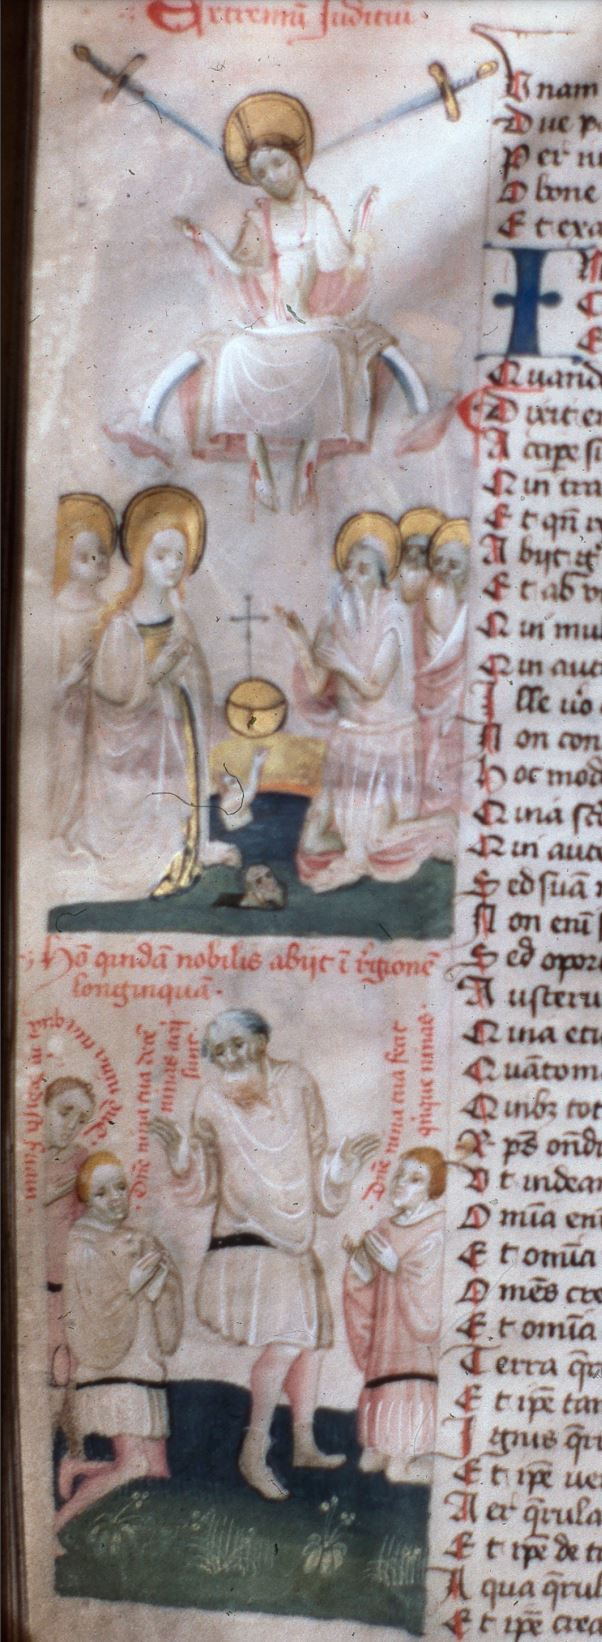 Speculum humanae salvationis 1415 -1425, Kanonie sv. Petra a Pavla 80, fol. 44v complet